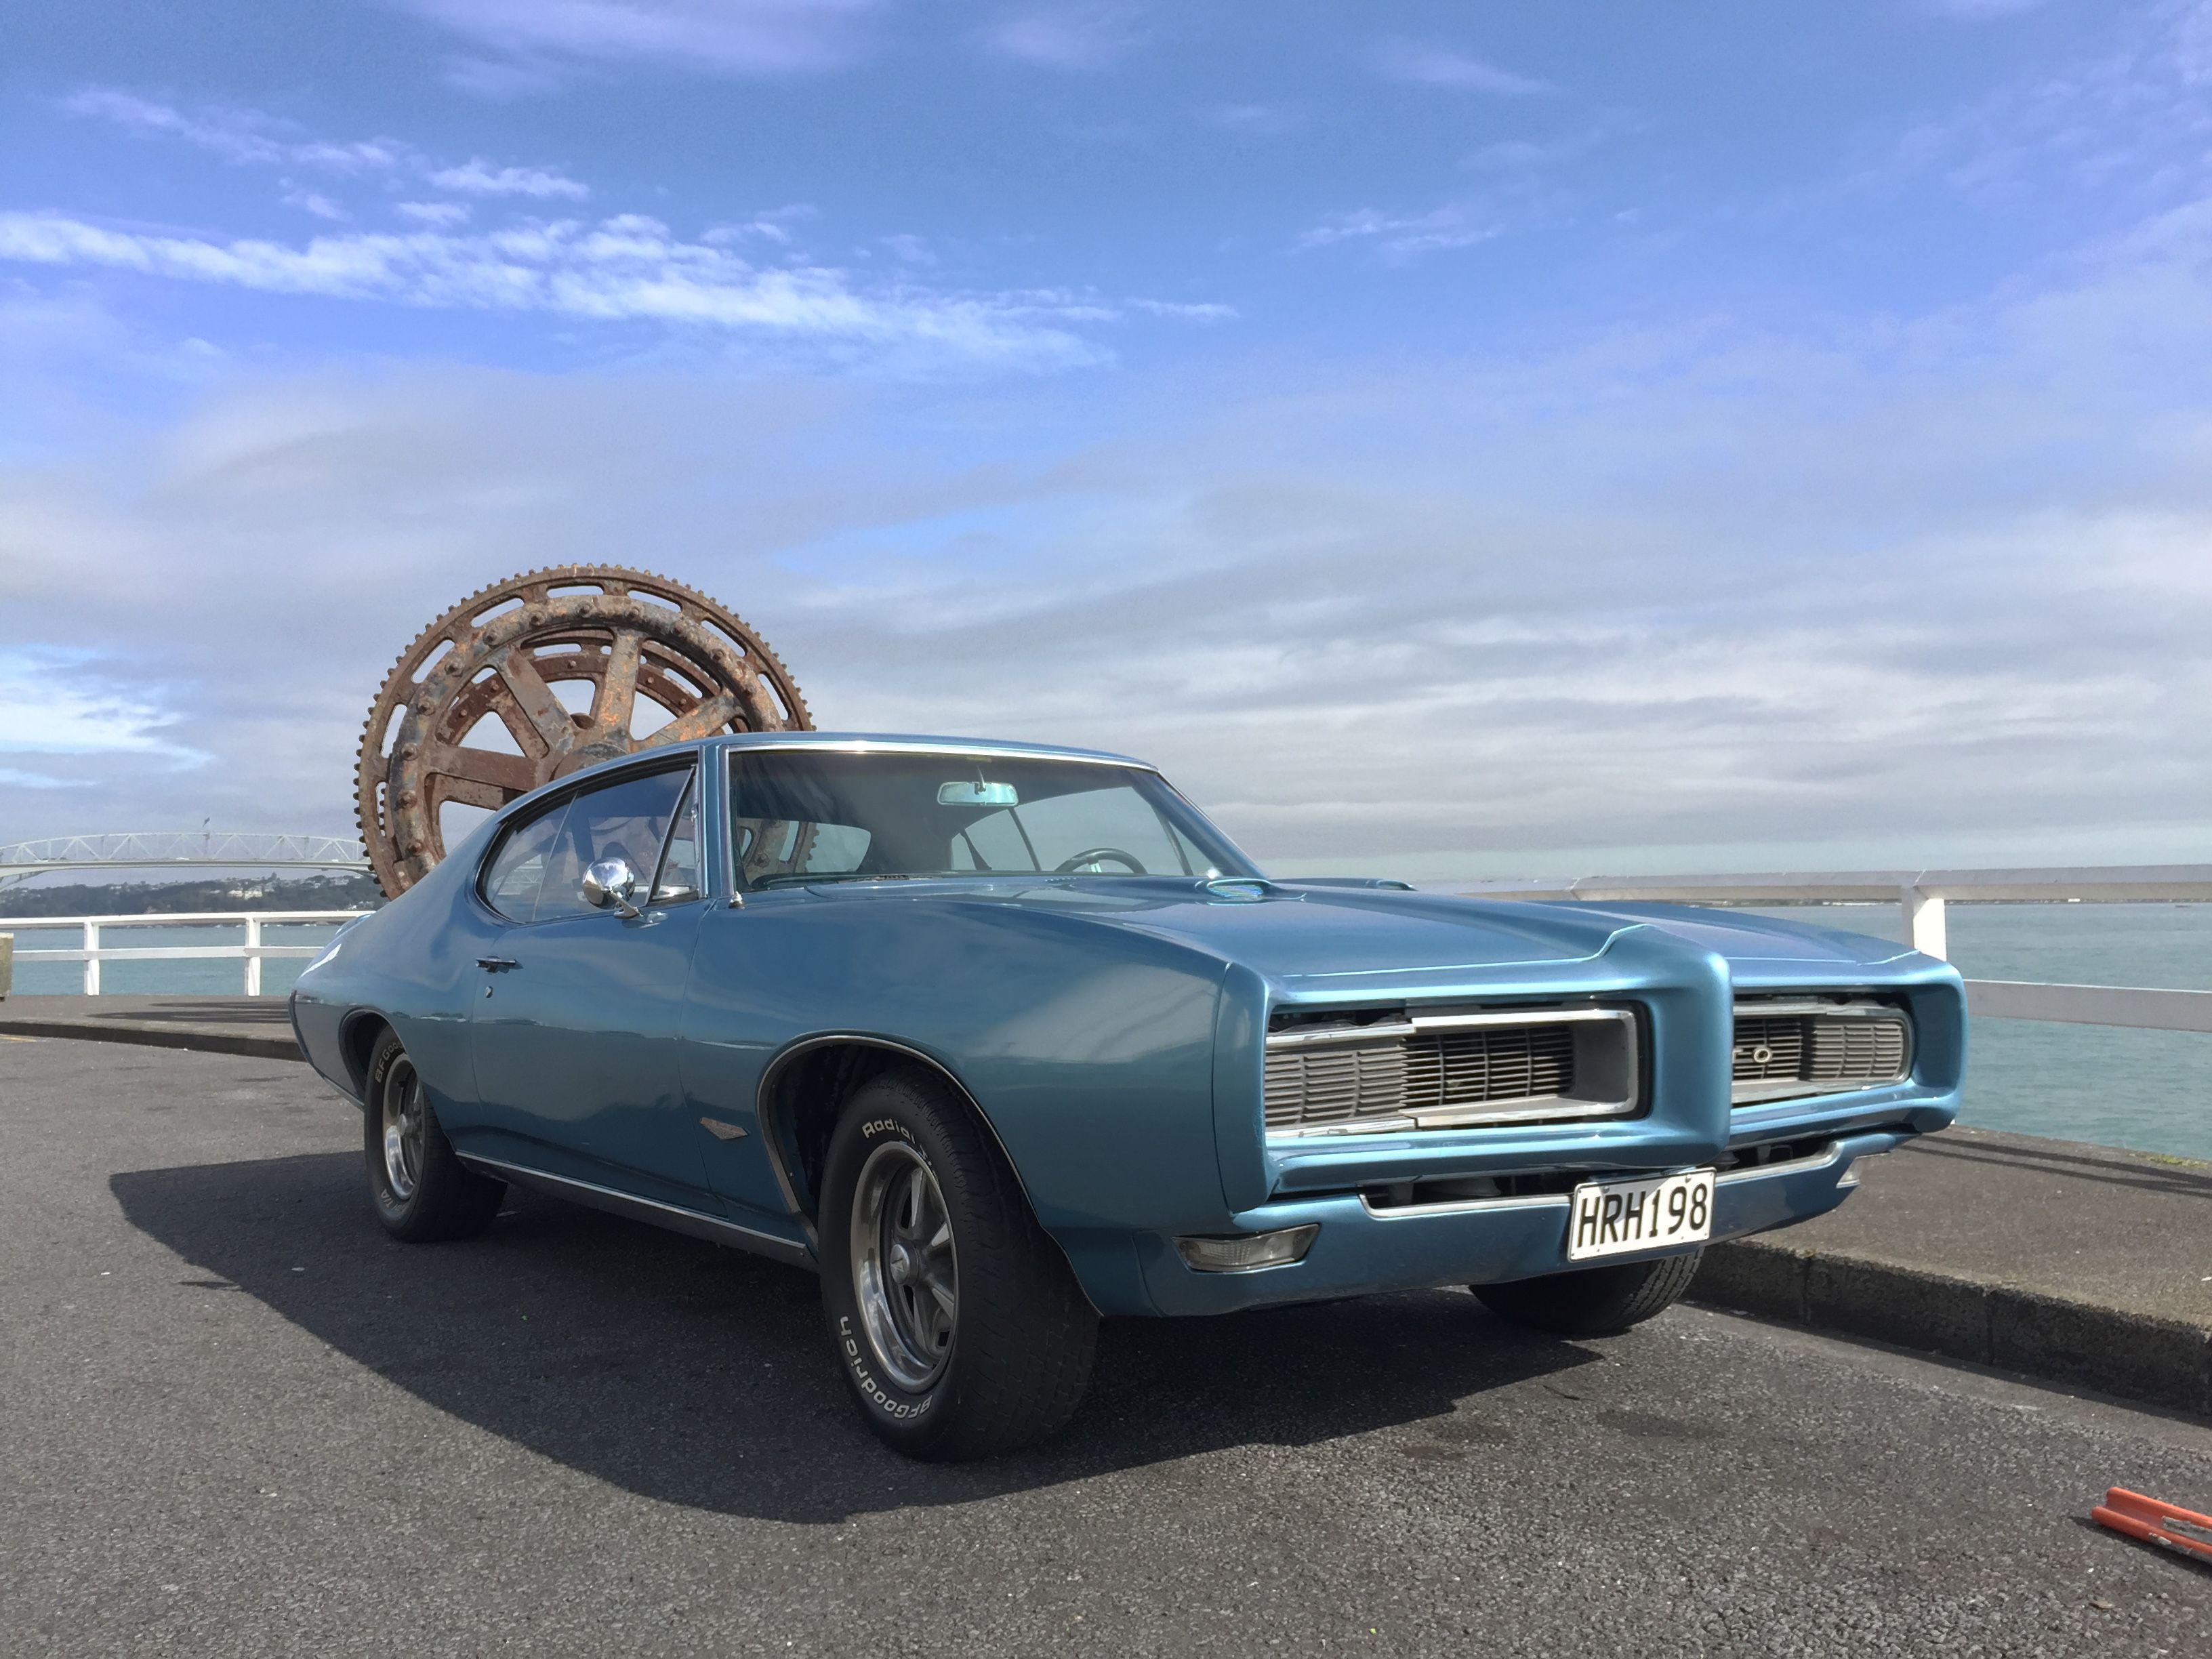 68 Gto Pontiac Gto Pinterest Gto Pontiac Gto And Mustang Mach 1